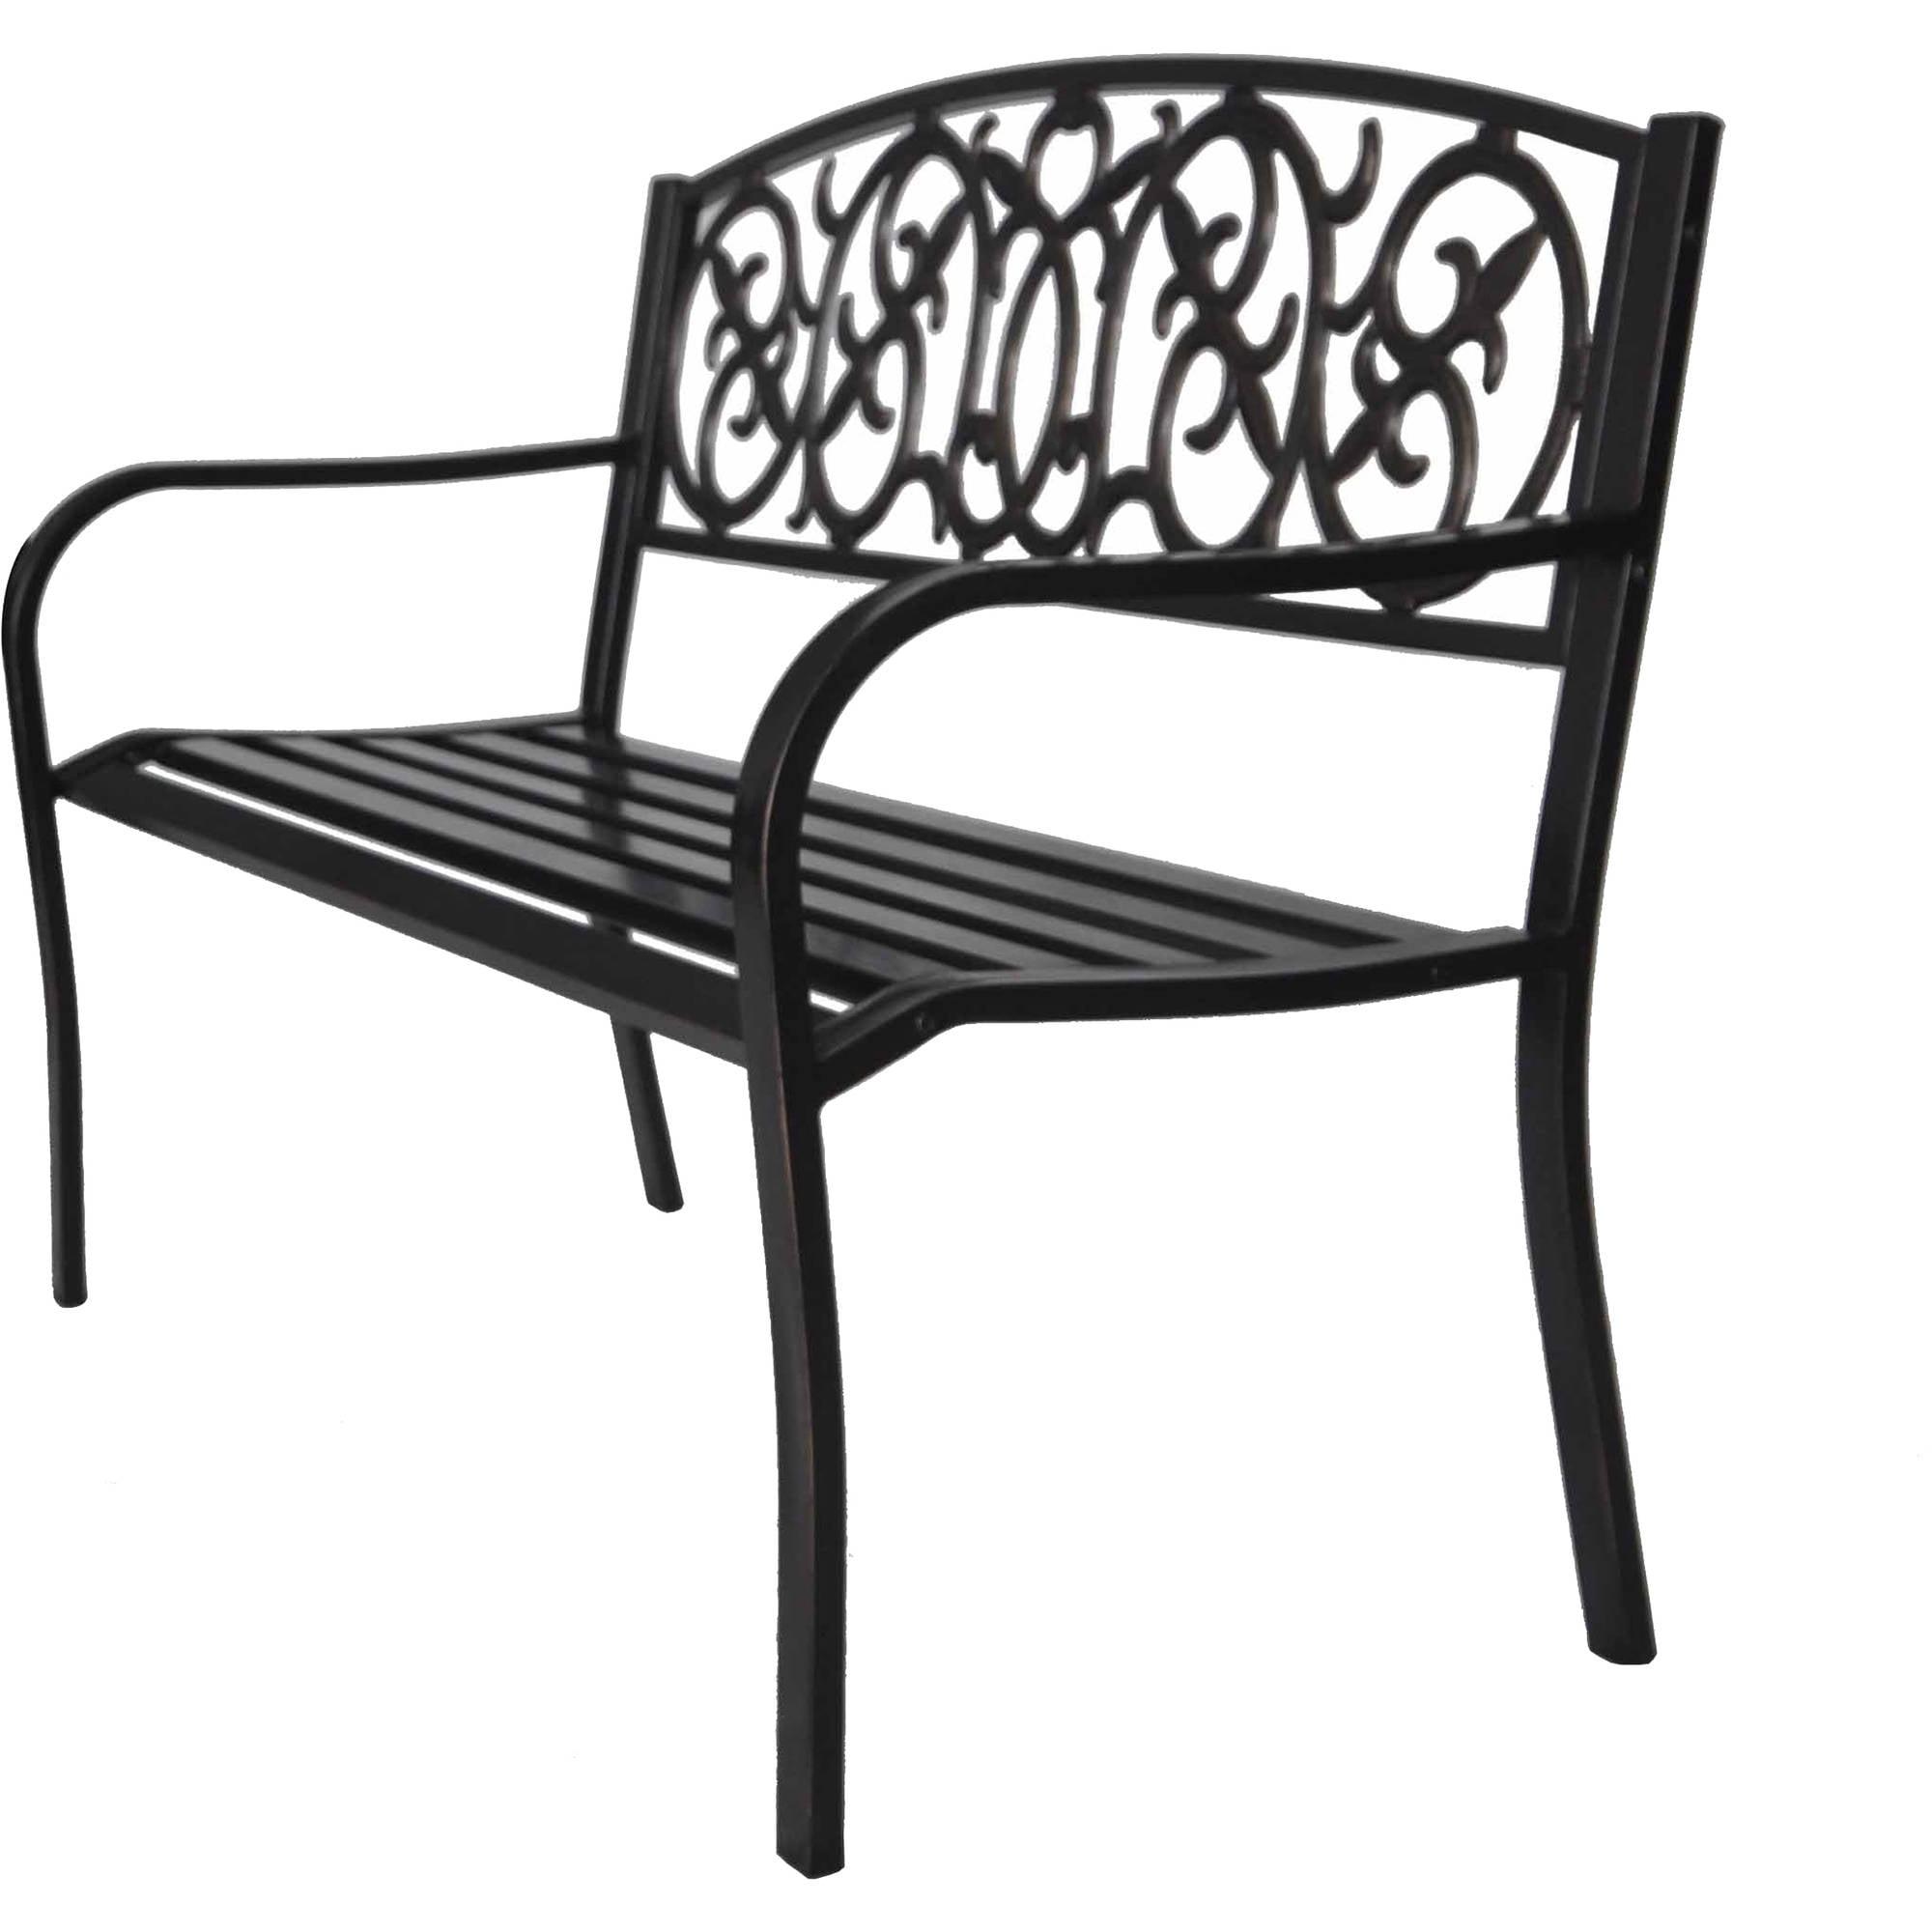 Brush Metal Park Bench Buy W Cushion And Save Walmart Com